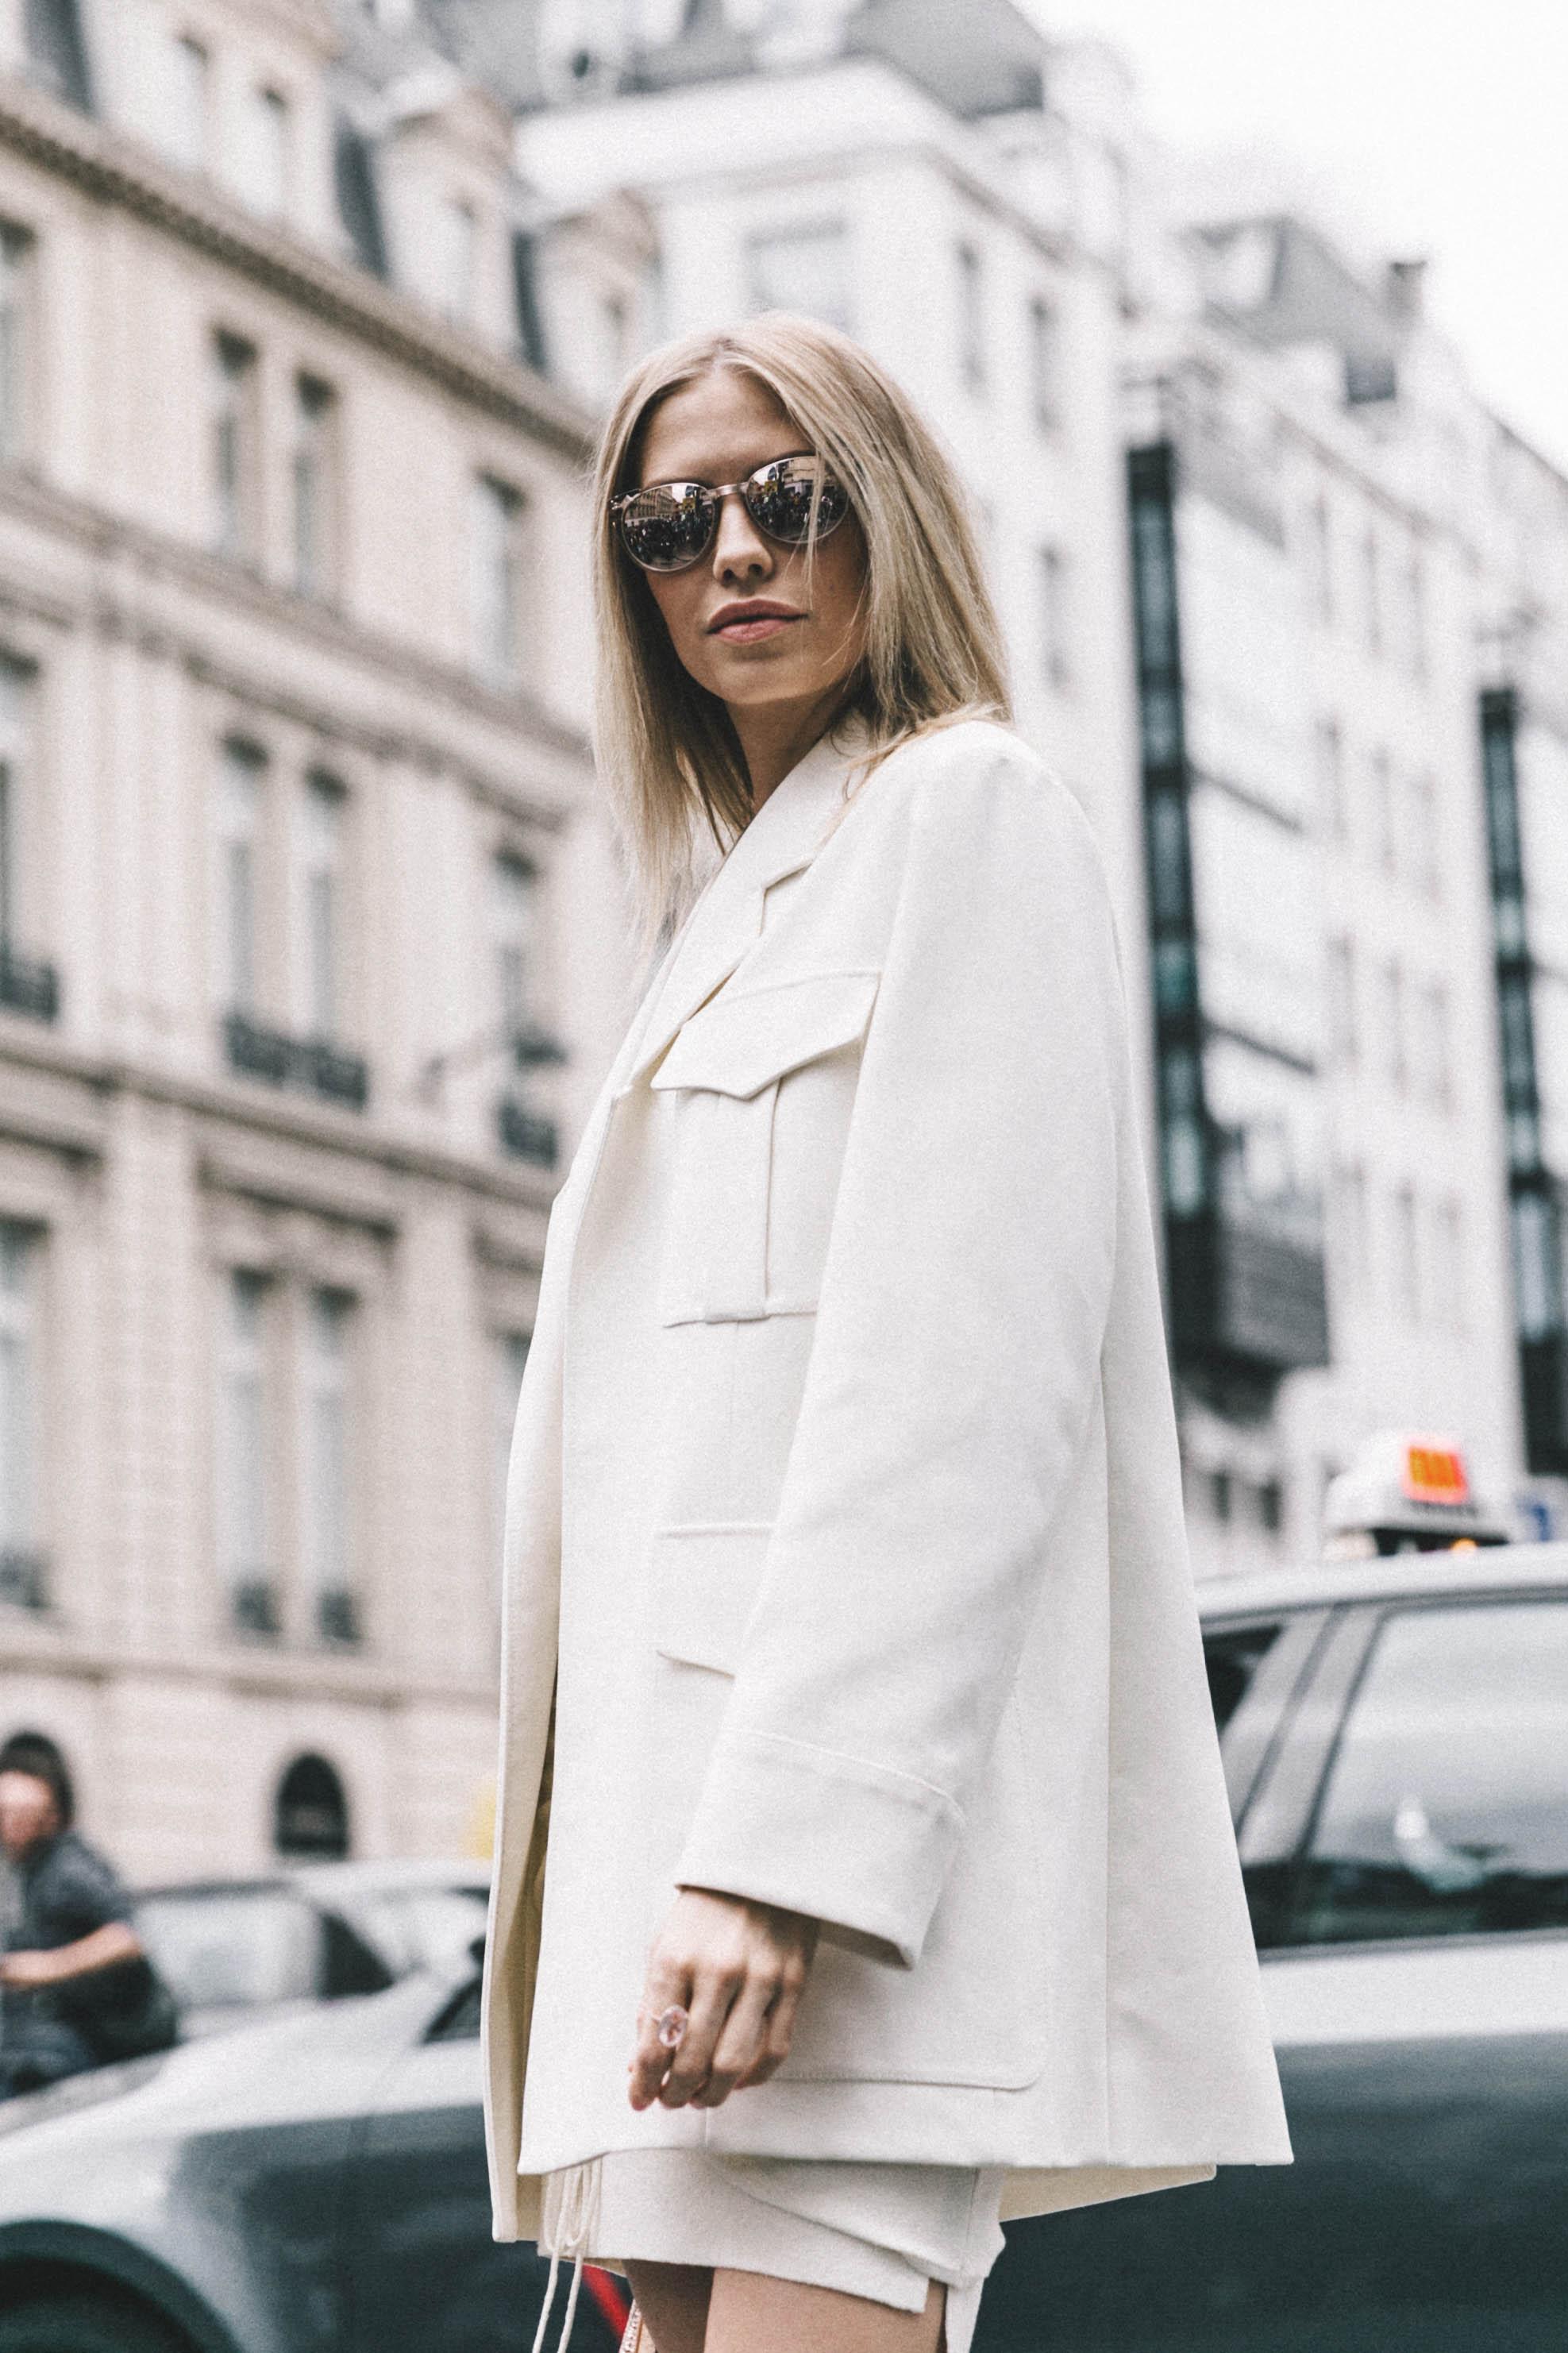 paris_couture_fashion_week-collage_vintage-90